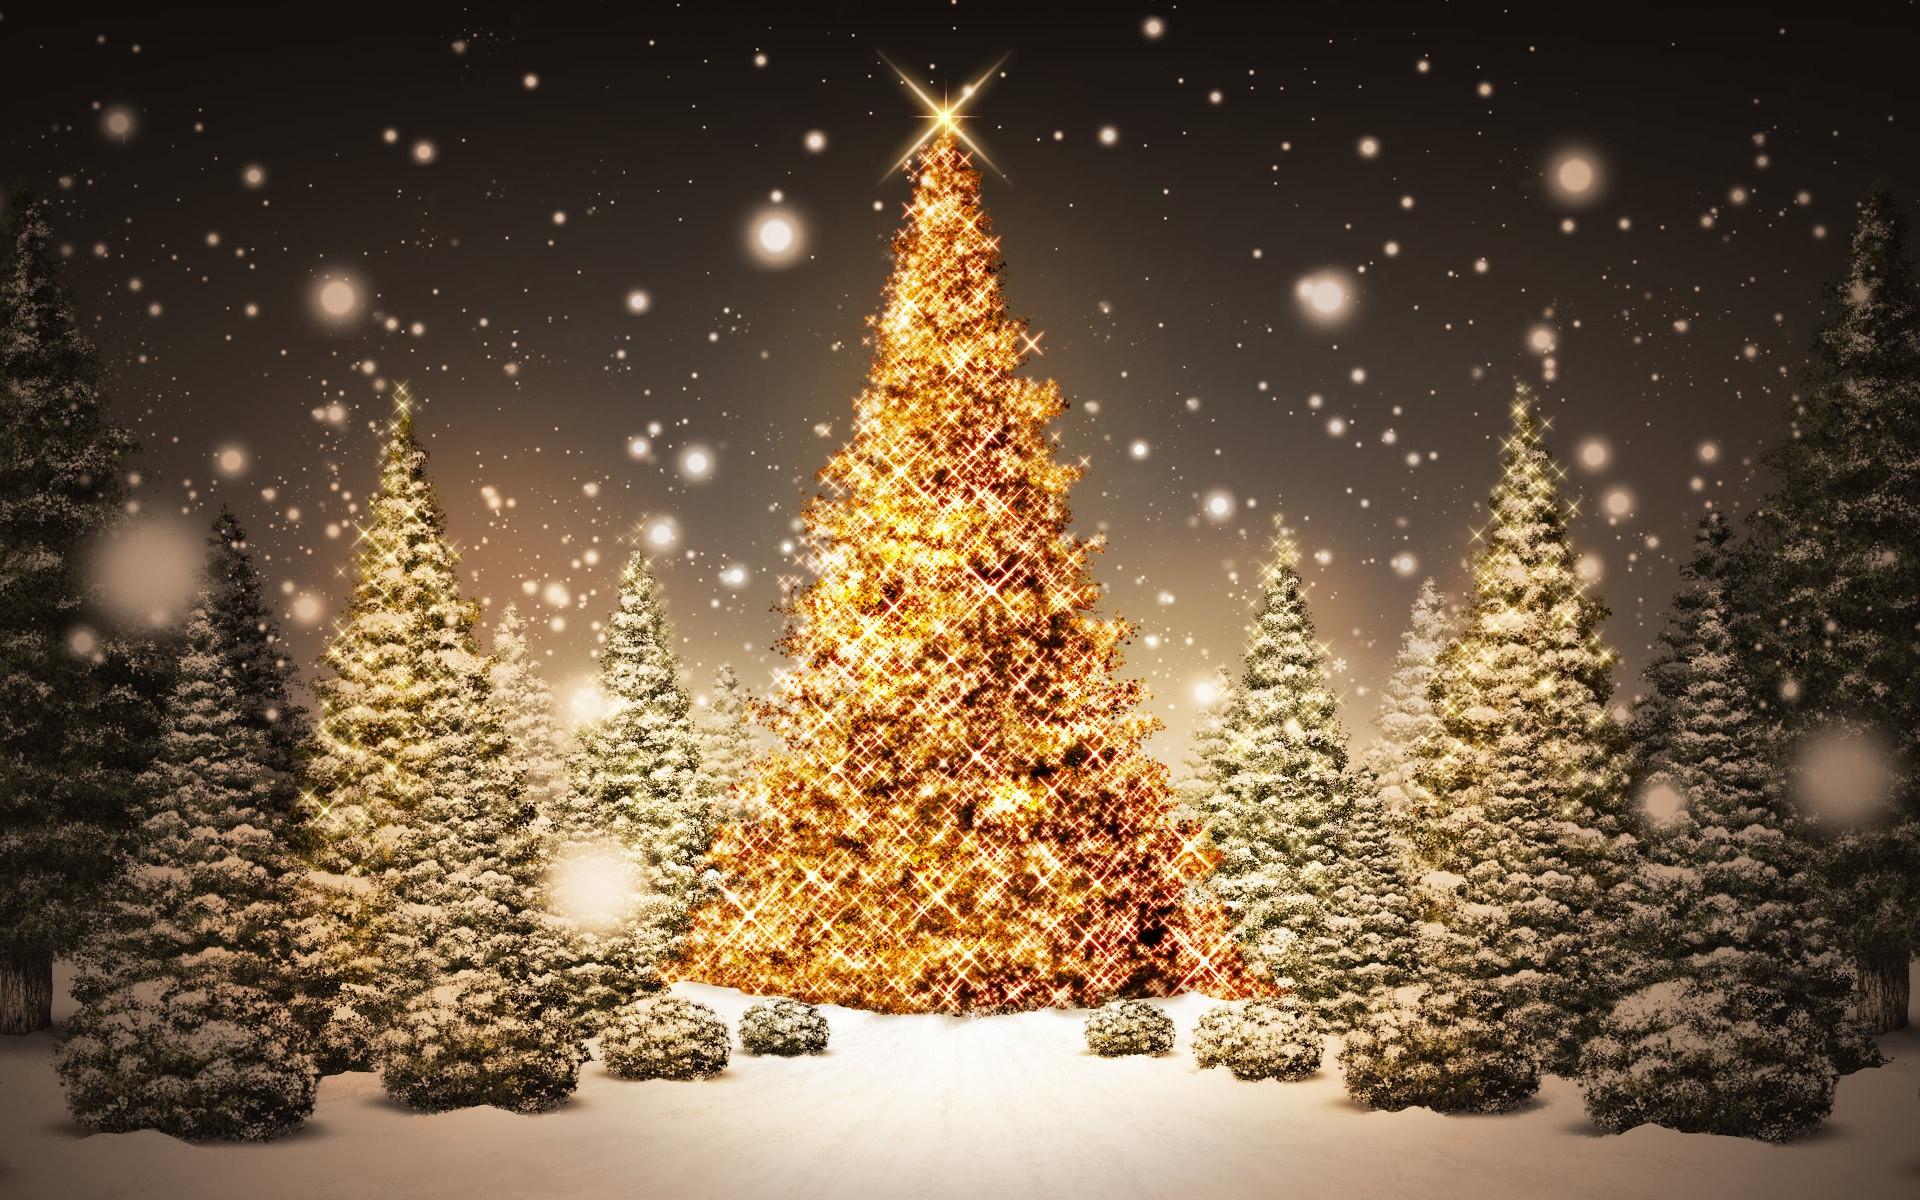 77 Free Christmas Tree Wallpaper On Wallpapersafari